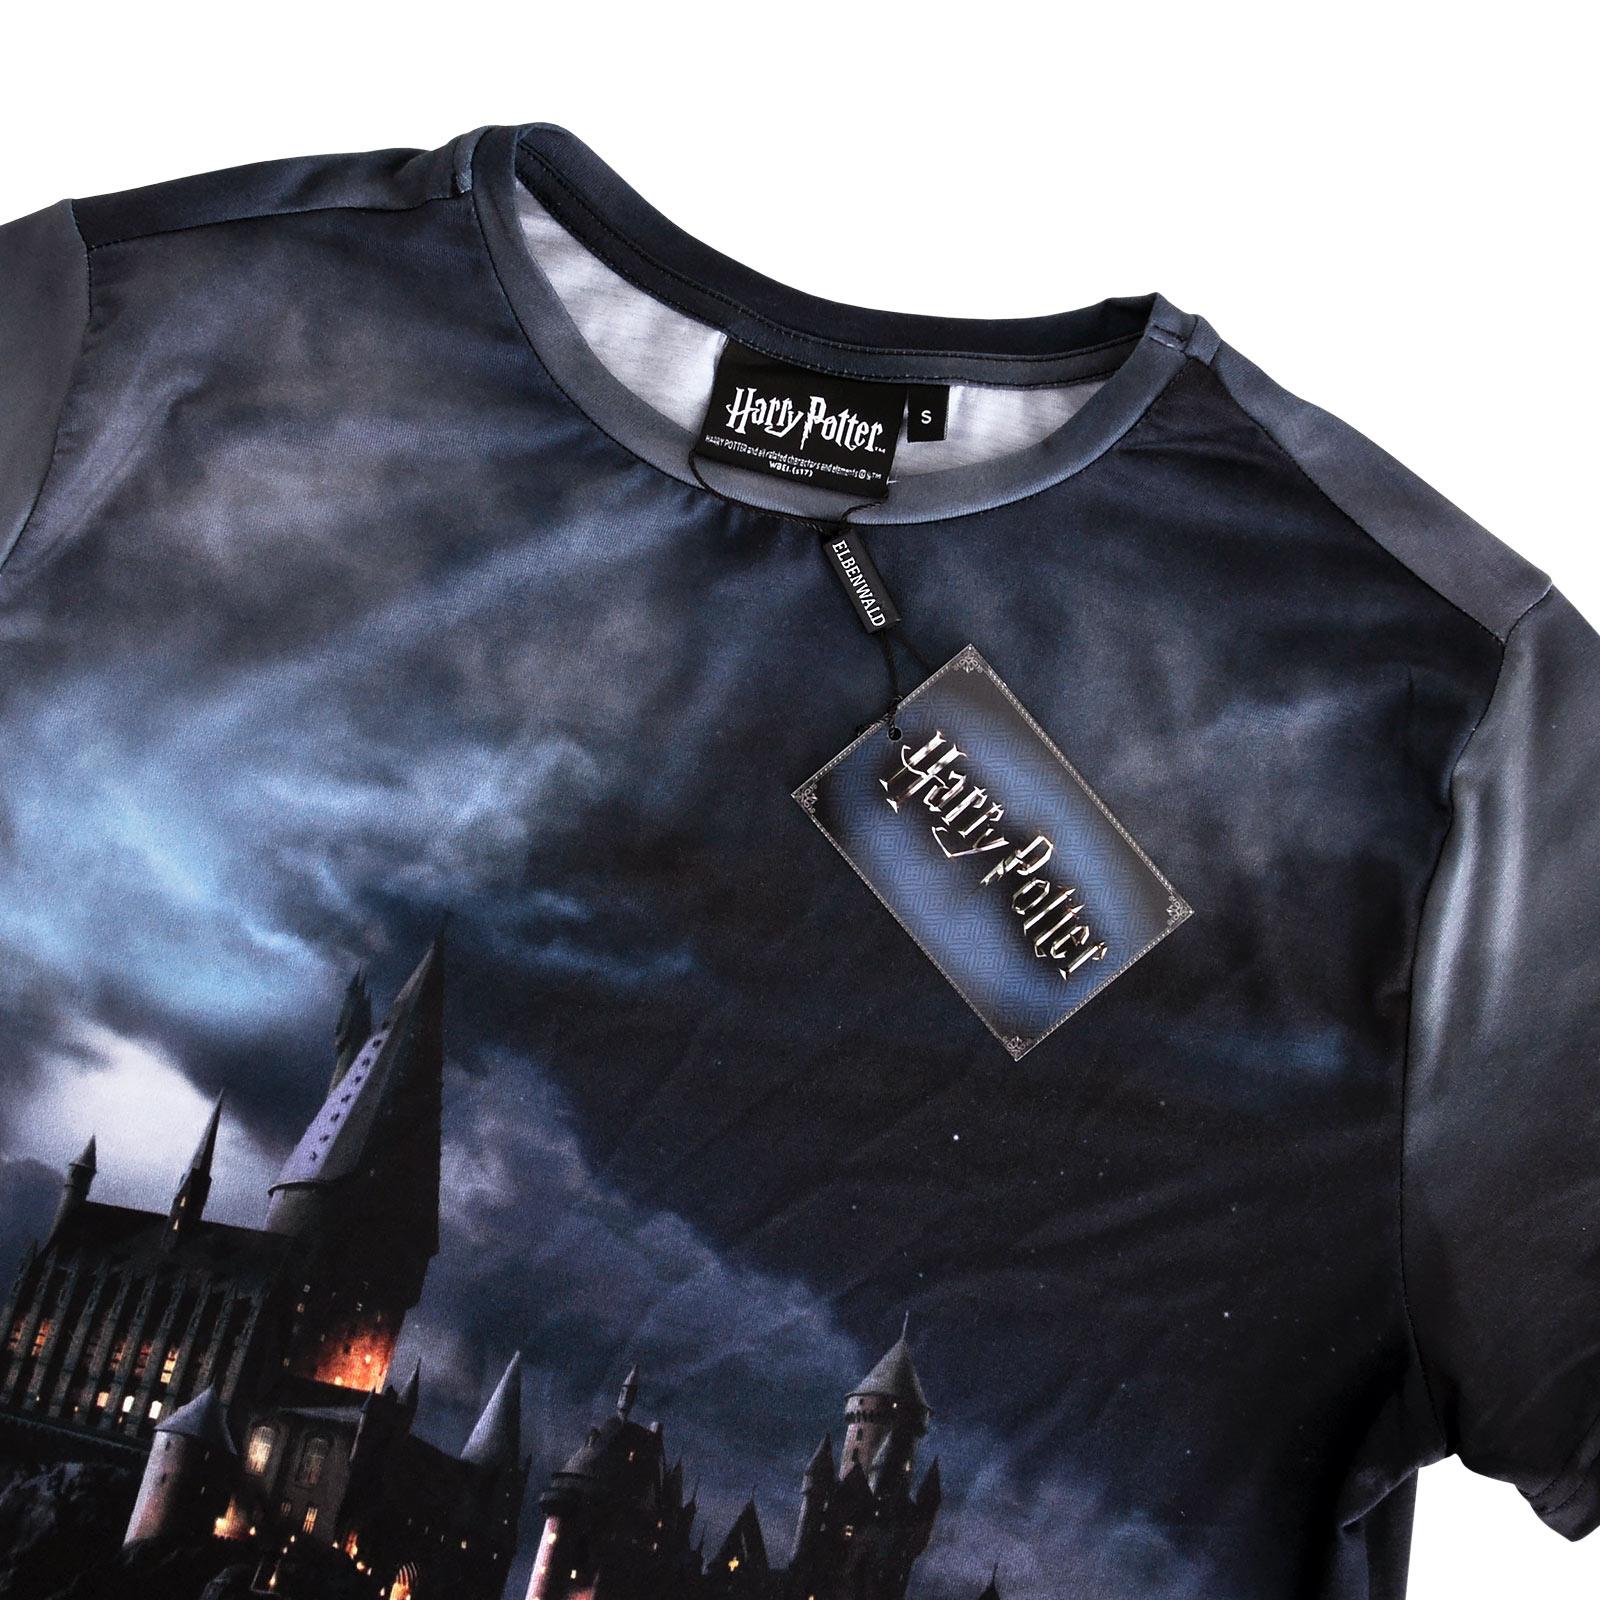 Harry Potter - Hogwarts The Magic Begins T-Shirt